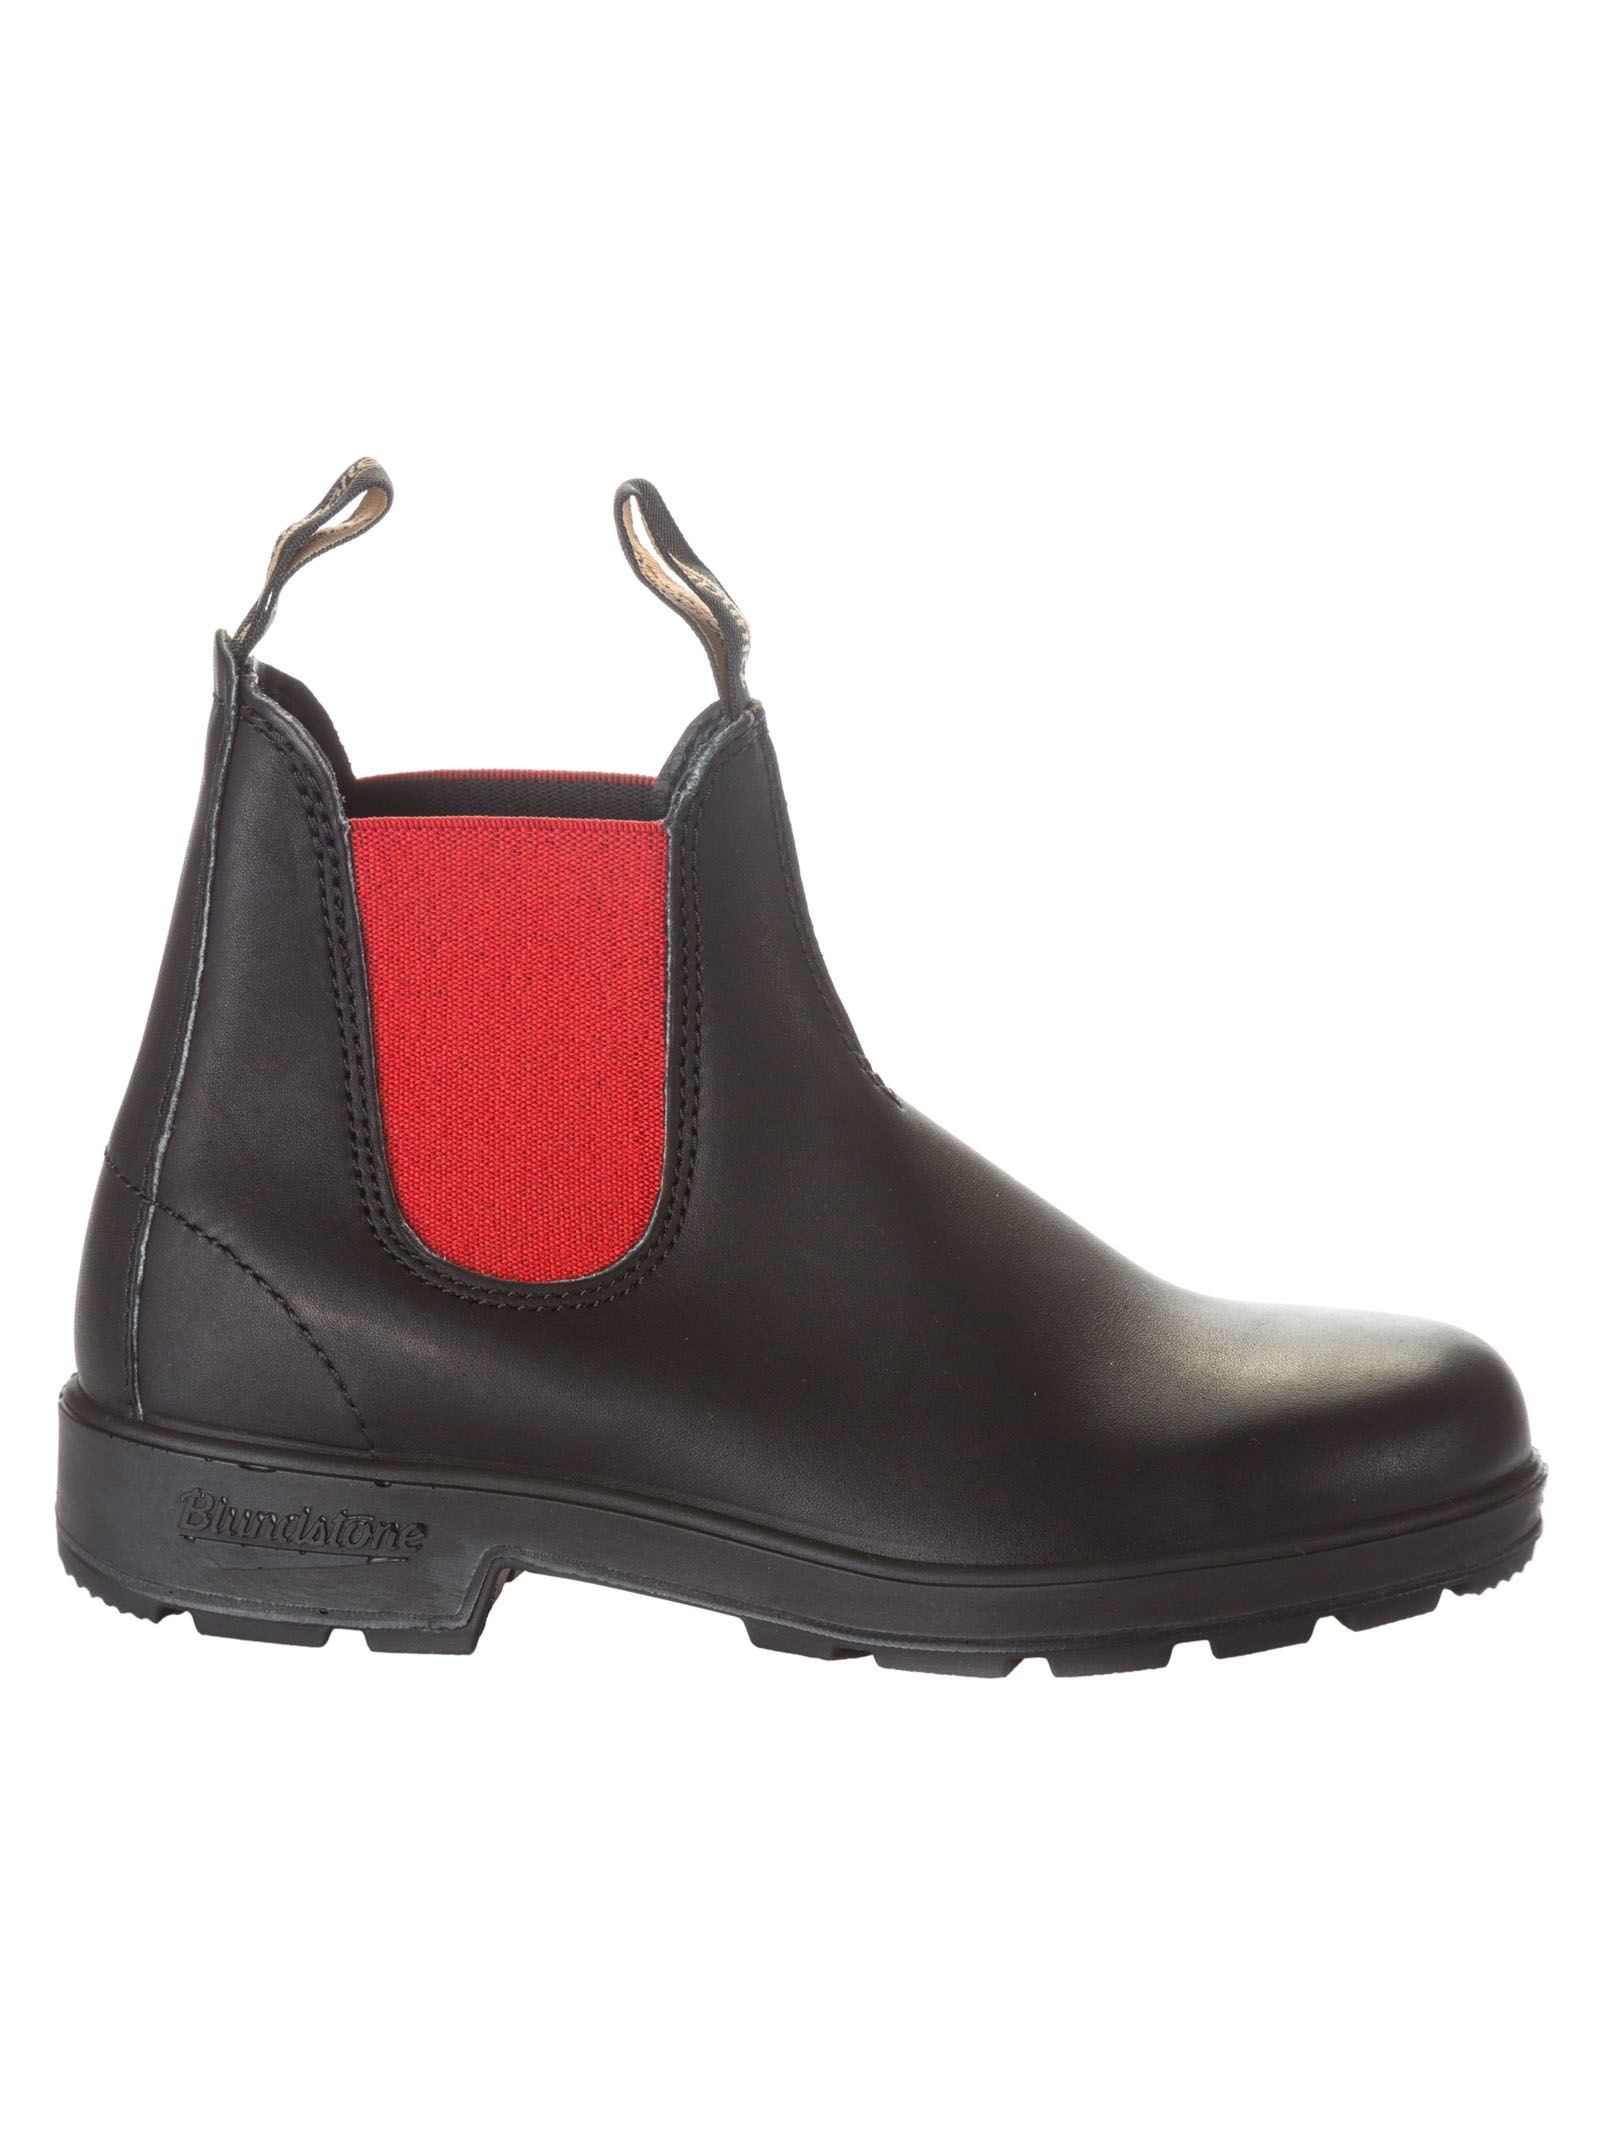 63192c0ef7cf Blundstone Blundstone Side Panel Ankle Boots - Black - 10682070 ...